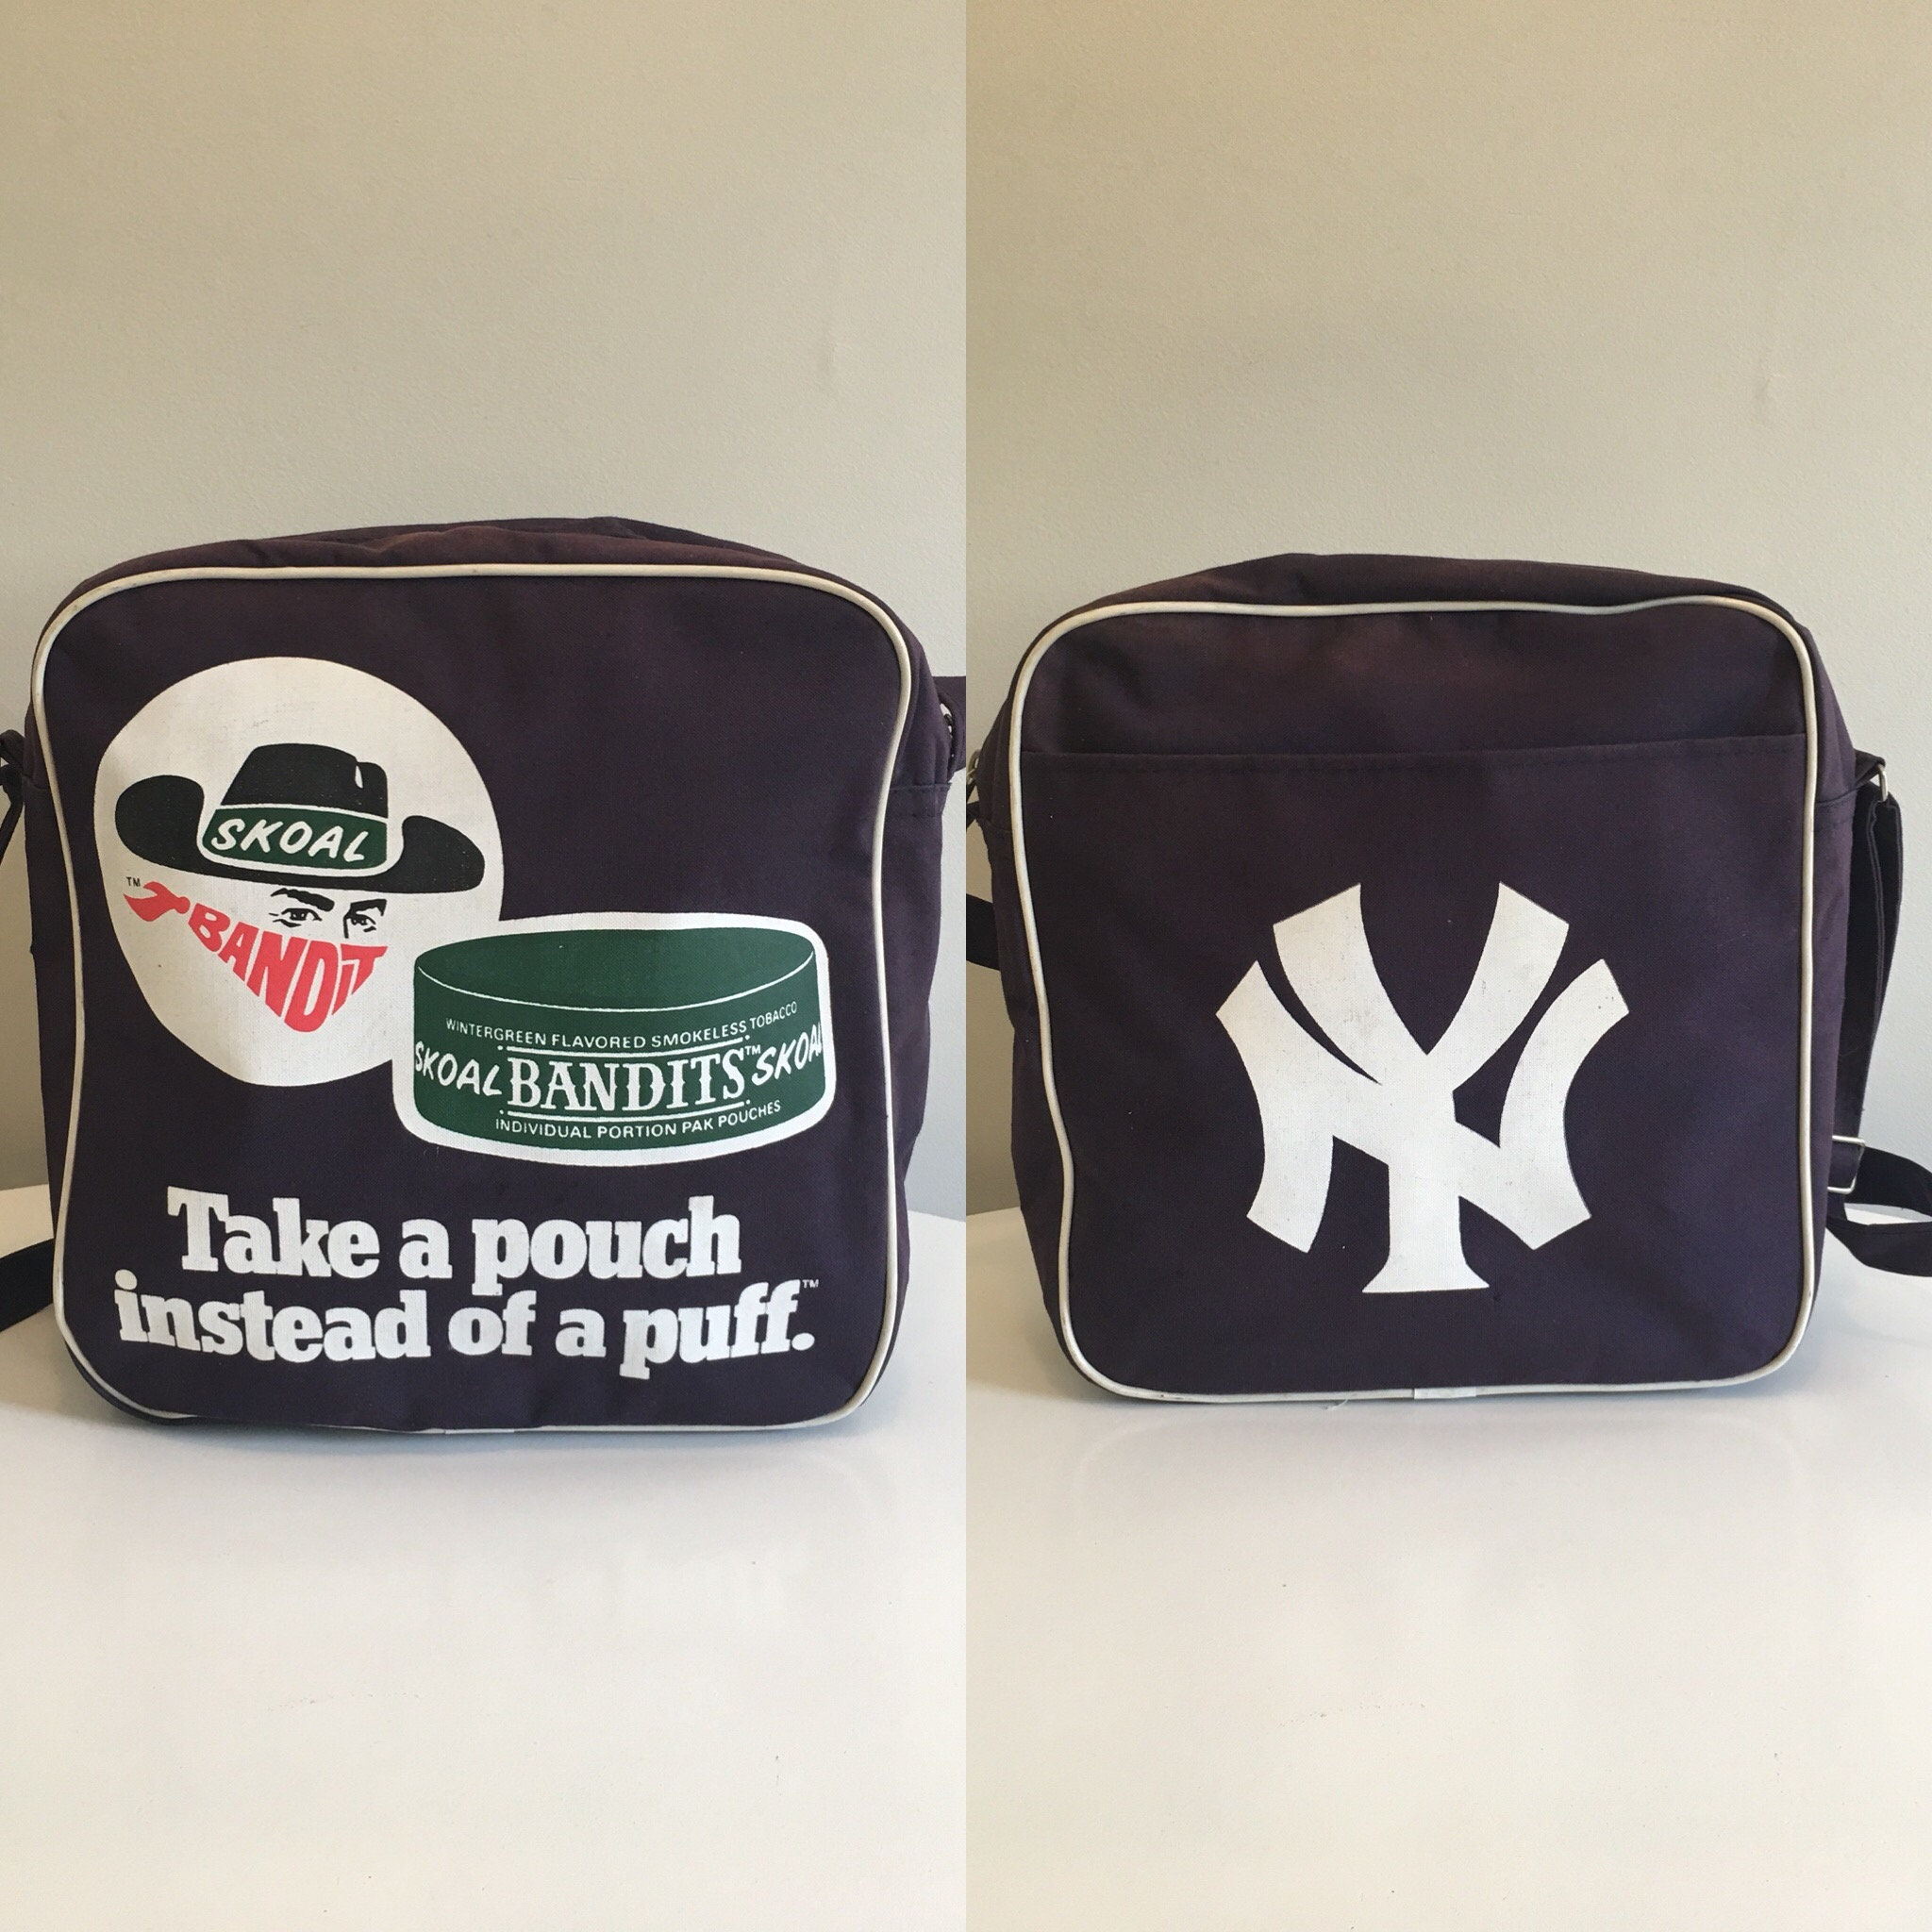 Vintage New York Yankees Skoal Bandits Tote Bag, Promotional Advertising  Tote Bag, Navy Blue Messenger Bag, Baseball Fan, Sports Fan Bag